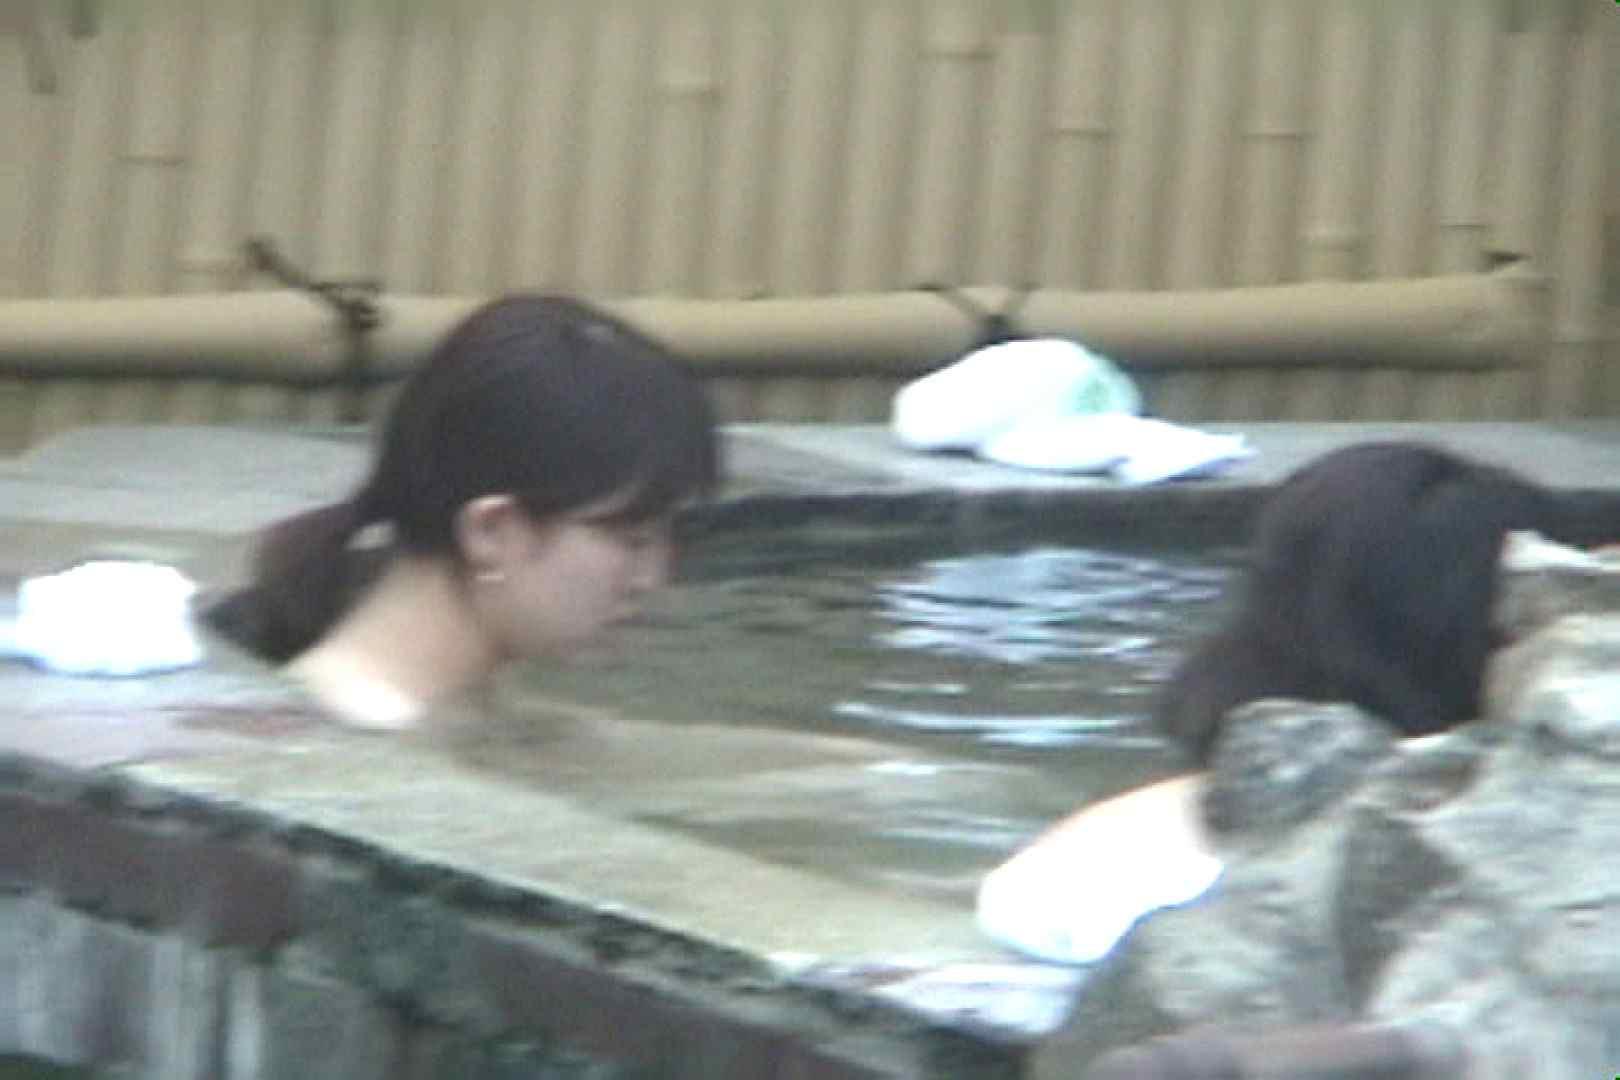 Aquaな露天風呂Vol.79【VIP限定】 盗撮 | HなOL  100pic 2